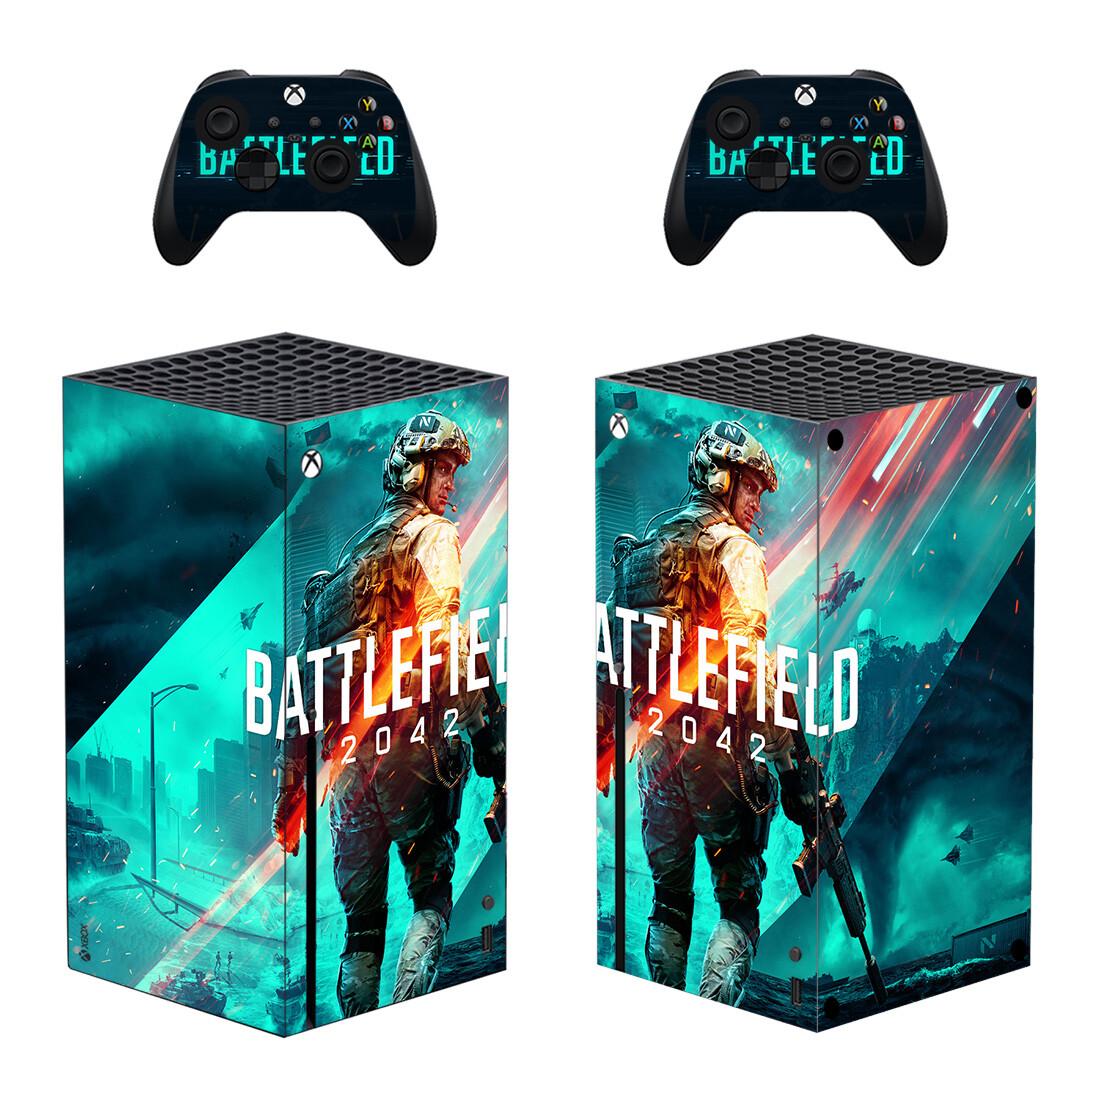 Battlefield 2042 Xbox Series X Skin Sticker Decal